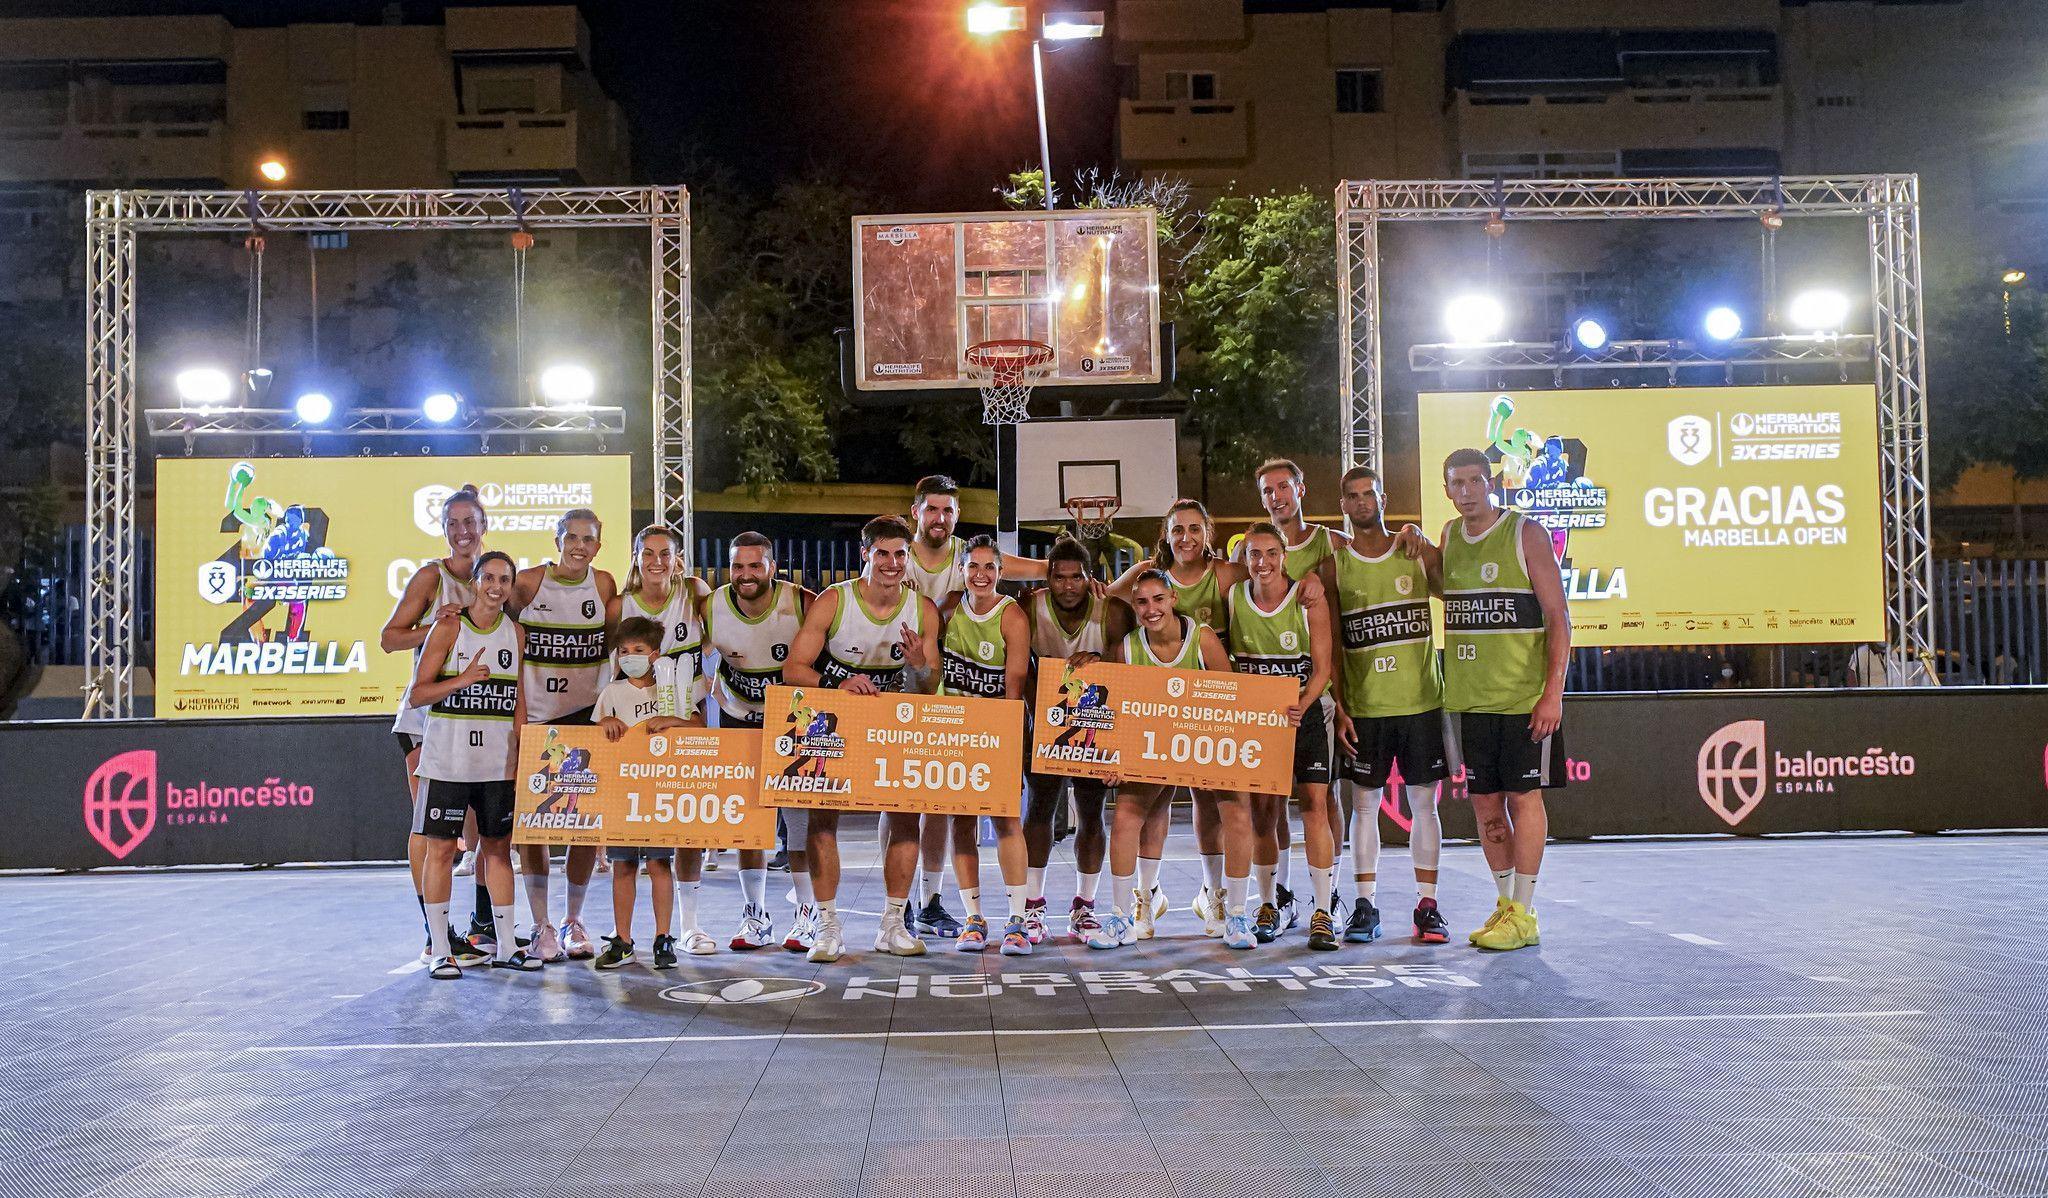 Final Torneo Marbella Open Herbalife 3x3 Series madison